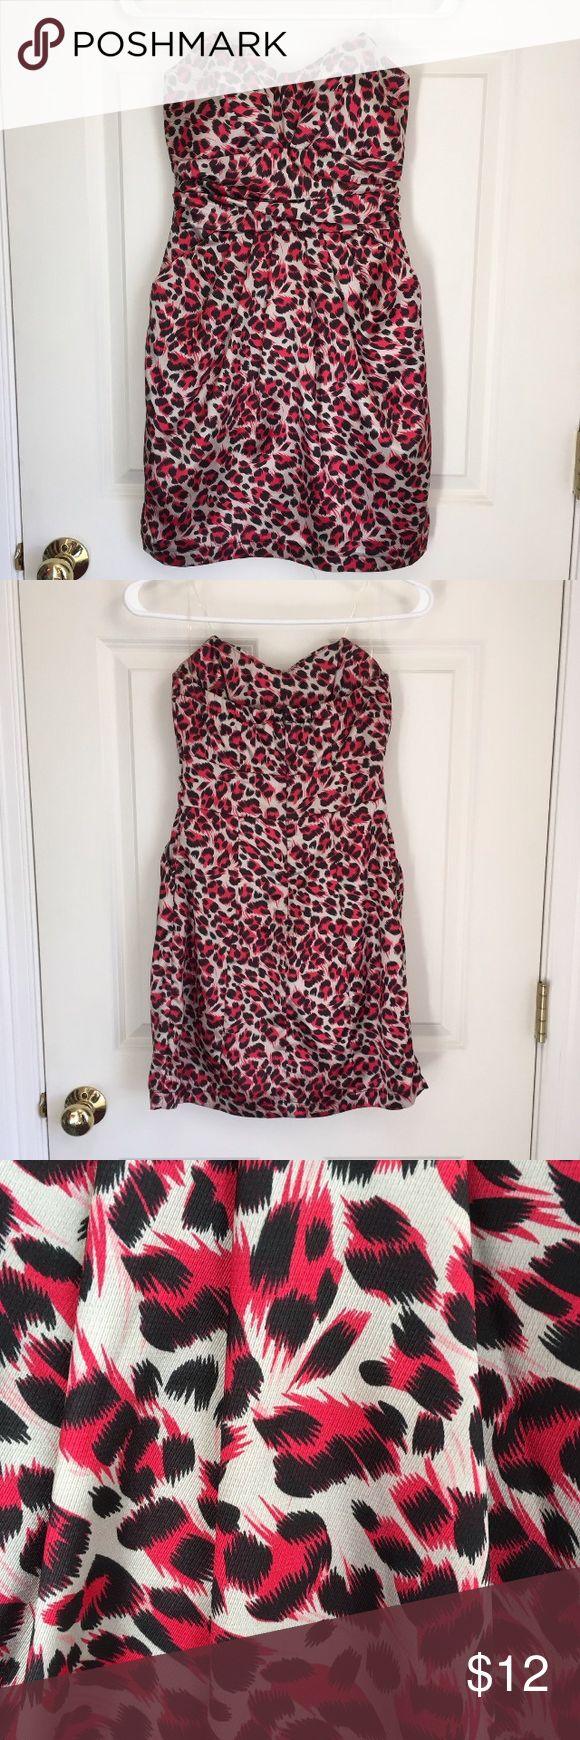 Animal print formal dress Charlotte Russe animal print formal dress. Size 0, worn once! Charlotte Russe Dresses Strapless